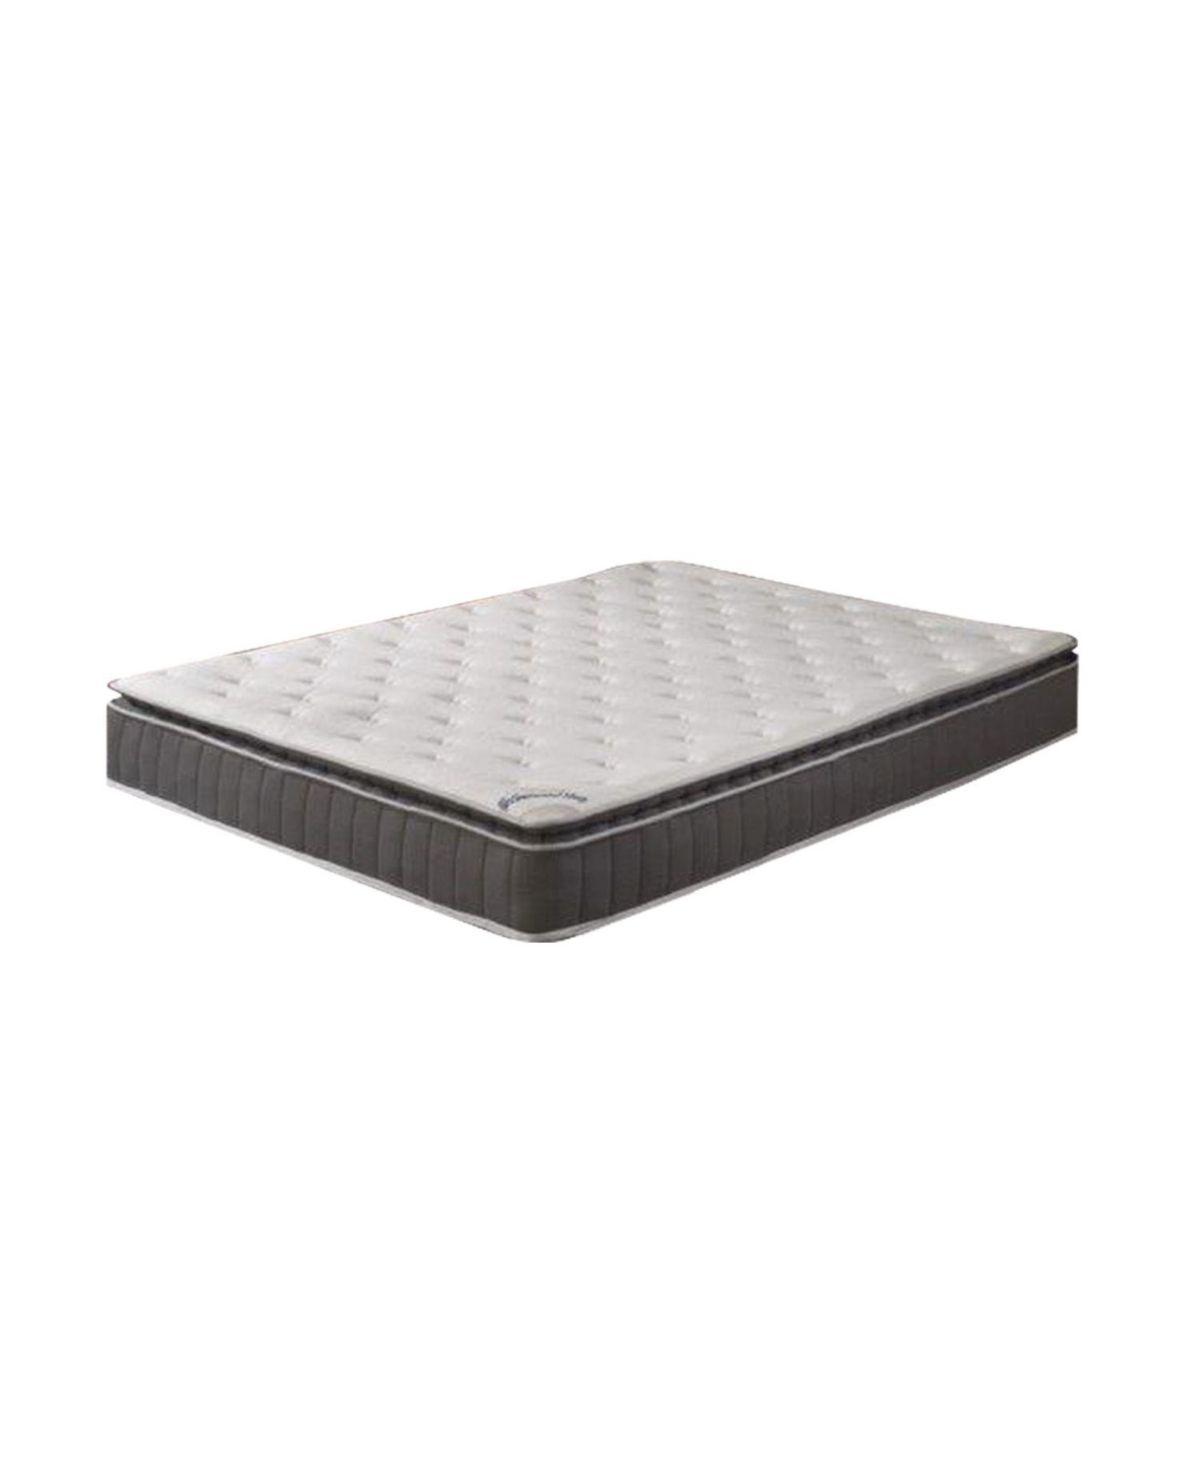 Foam Encased Pillow Top Mattress and Wood Box Spring or Foundation, Queen #pillowtopmattress